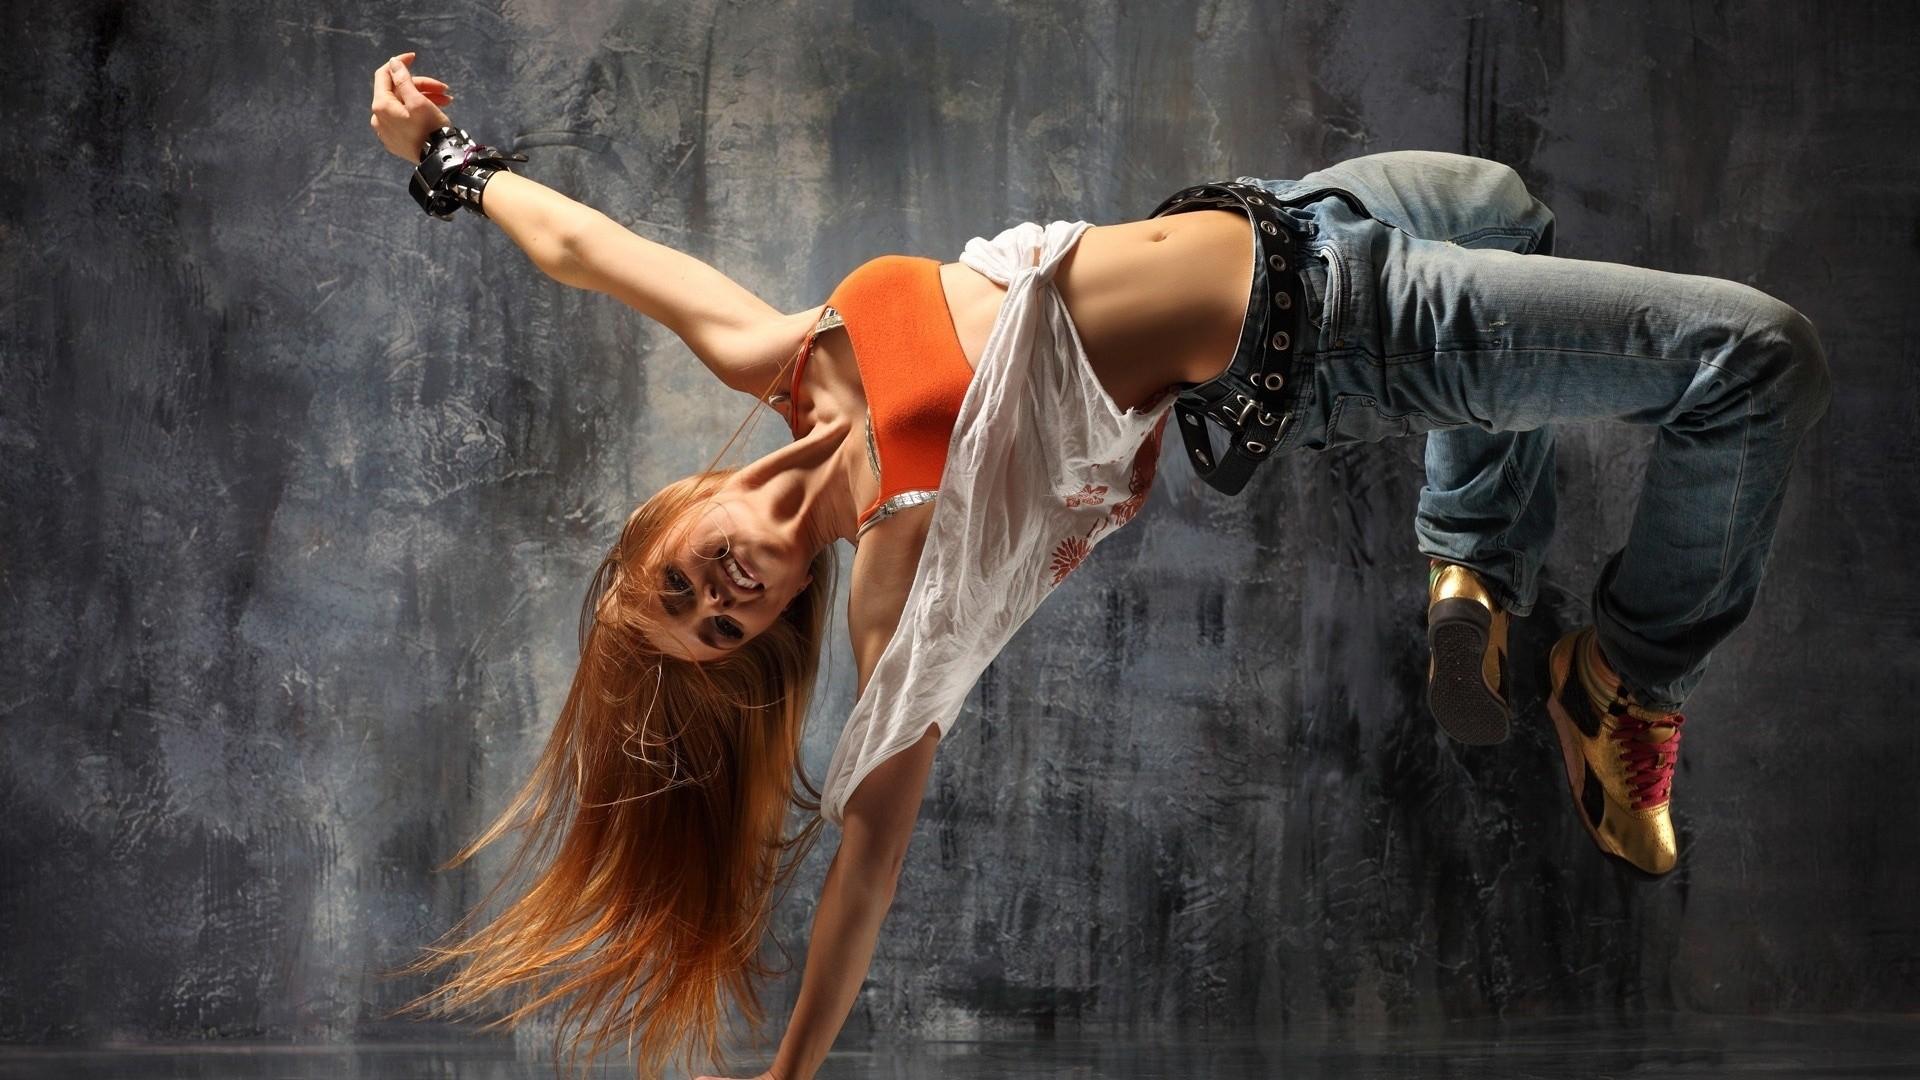 Dance HD Wallpaper